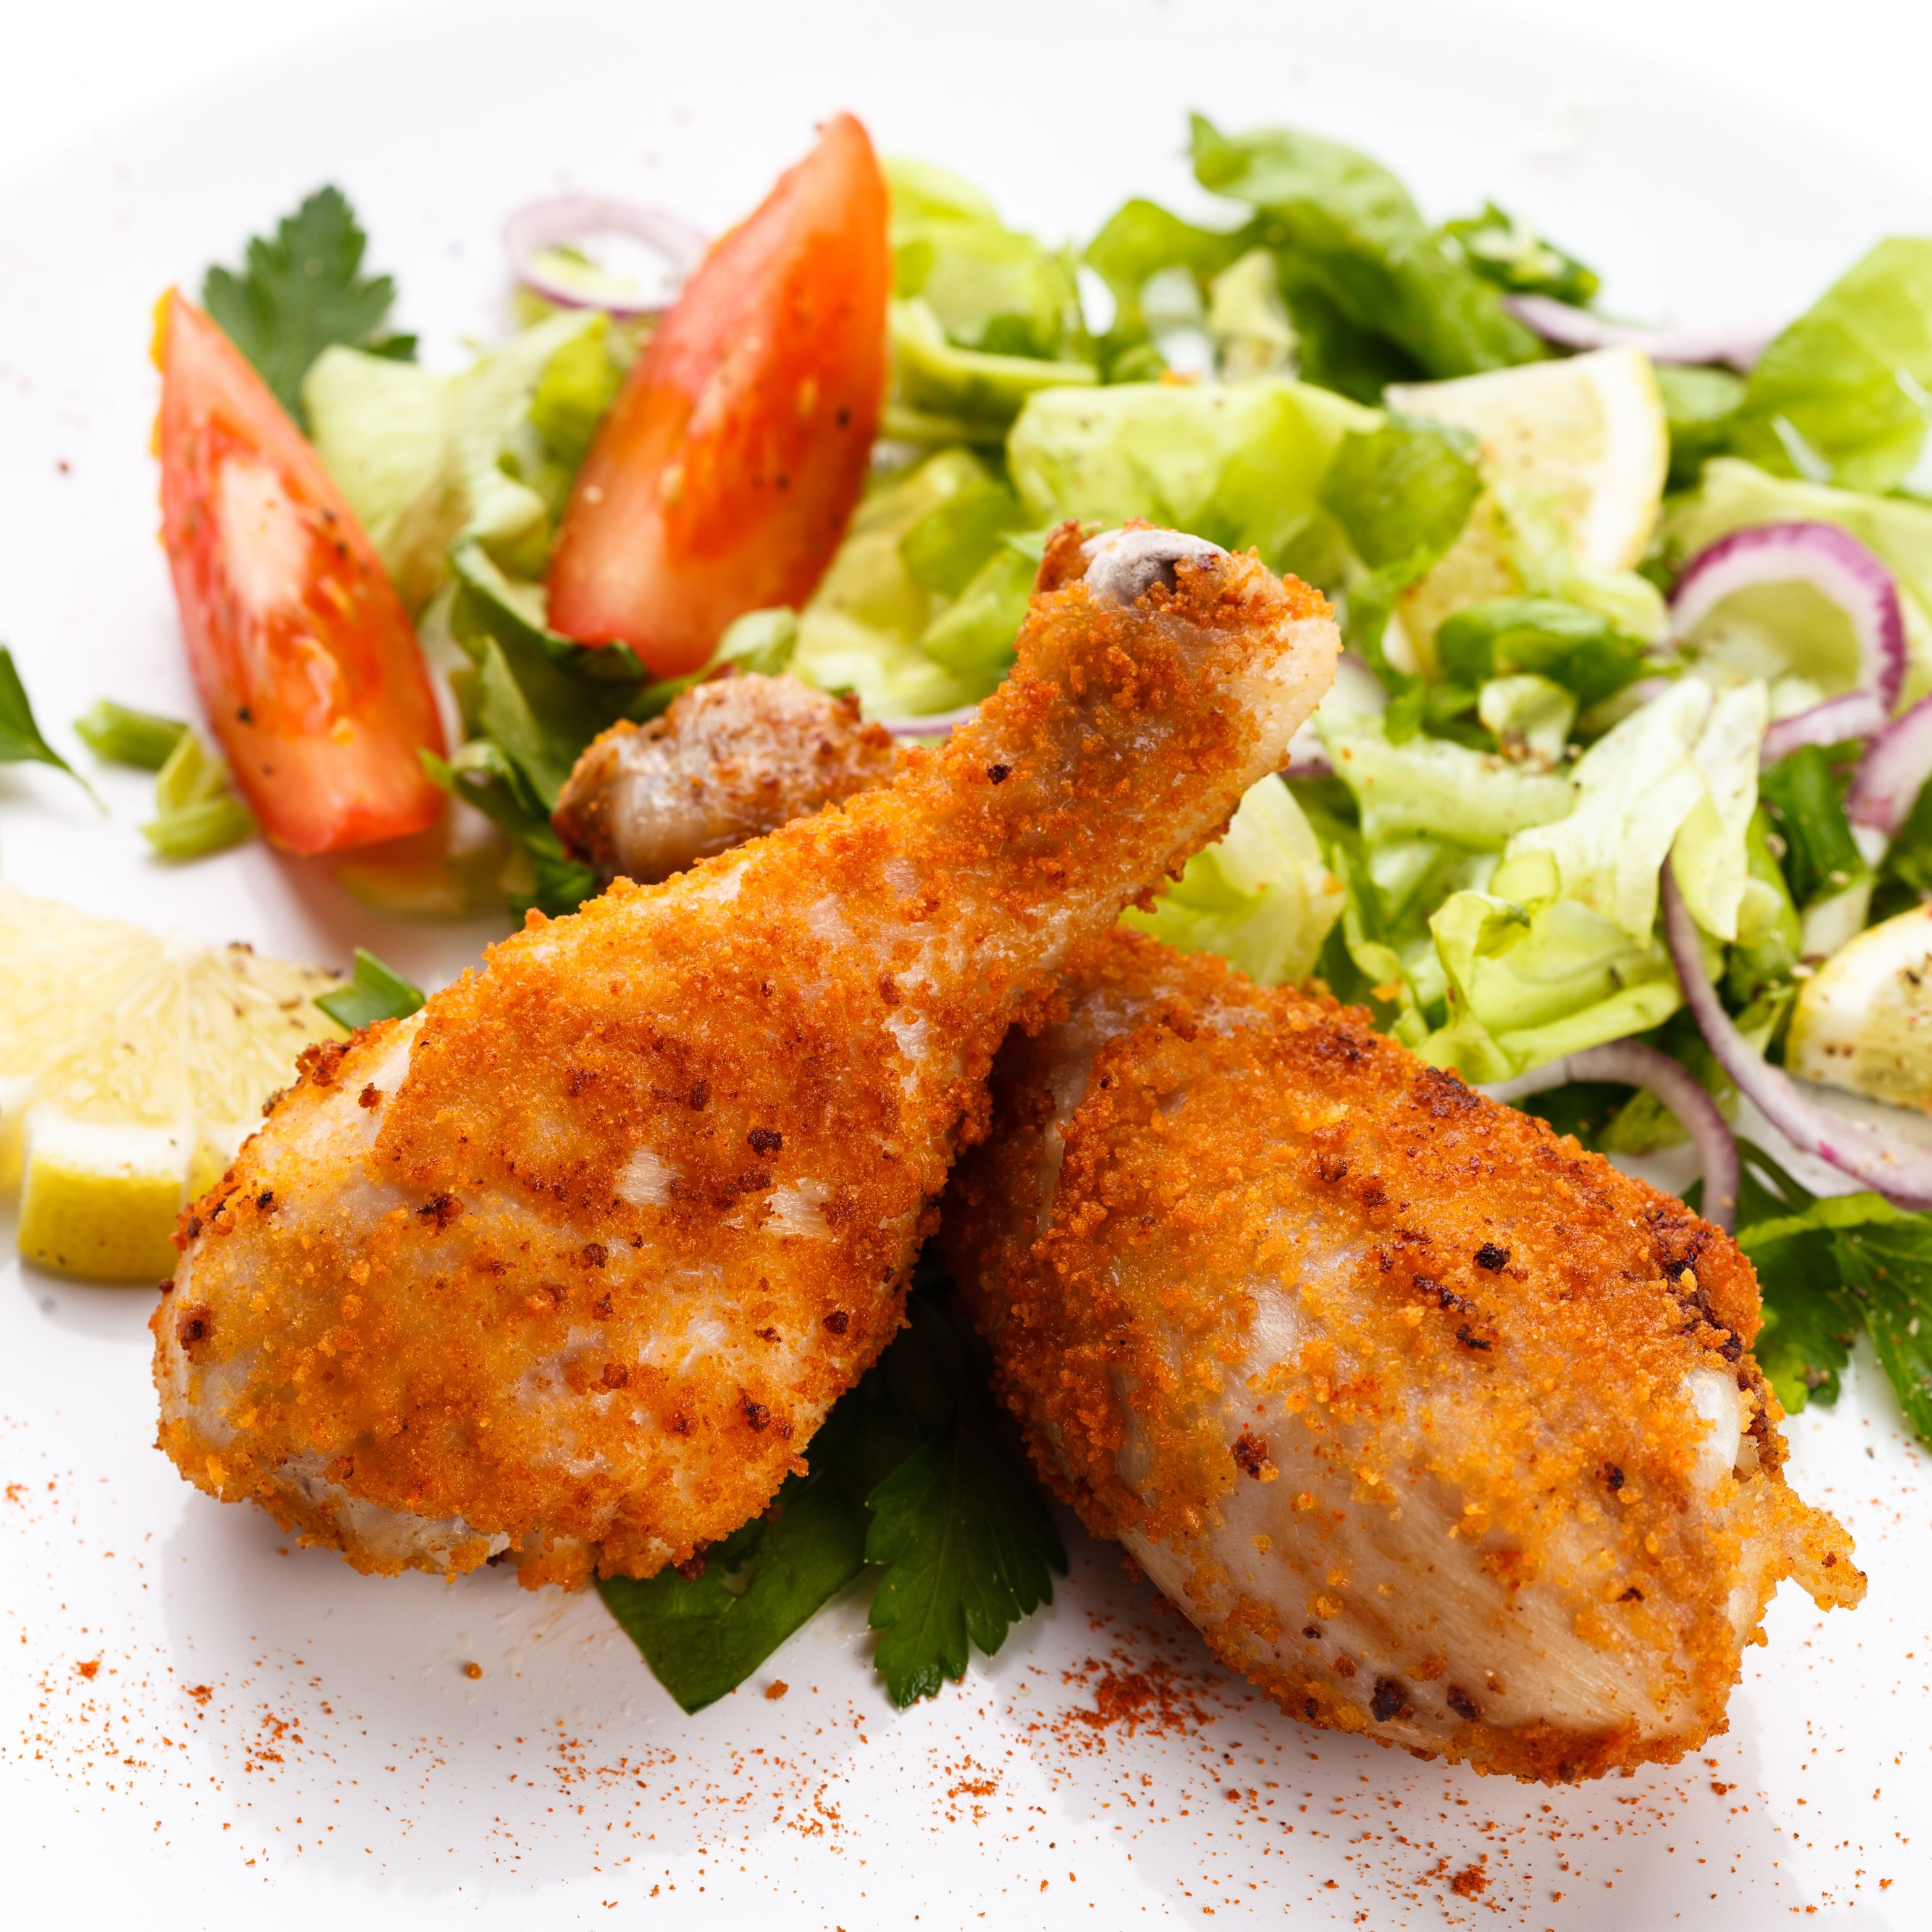 Simple Comfort Food: Breaded & Baked Chicken Drumsticks